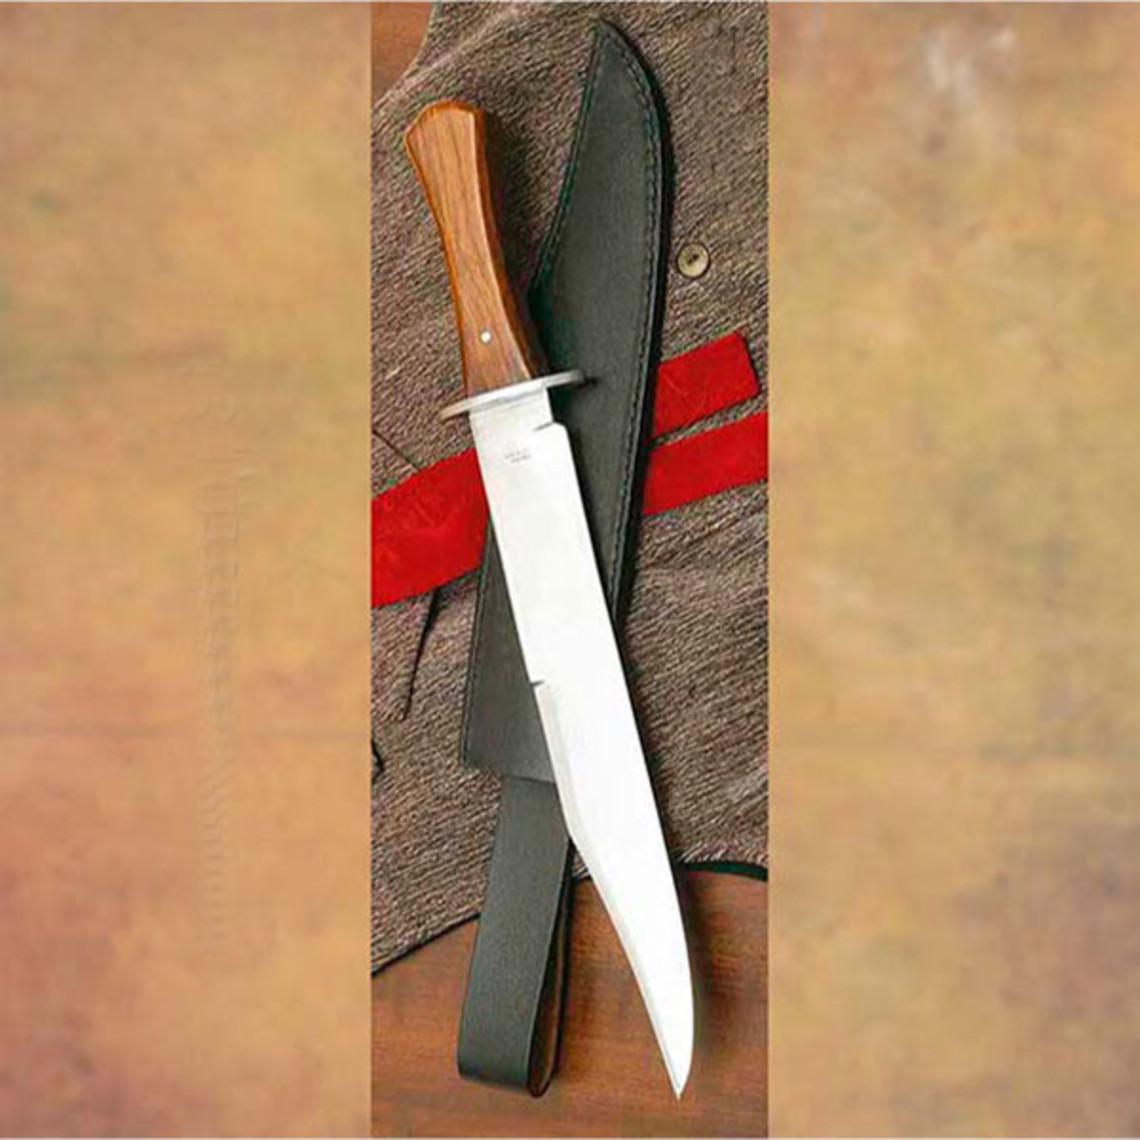 Windlass Steelcrafts Bowie cuchillo Louisiana